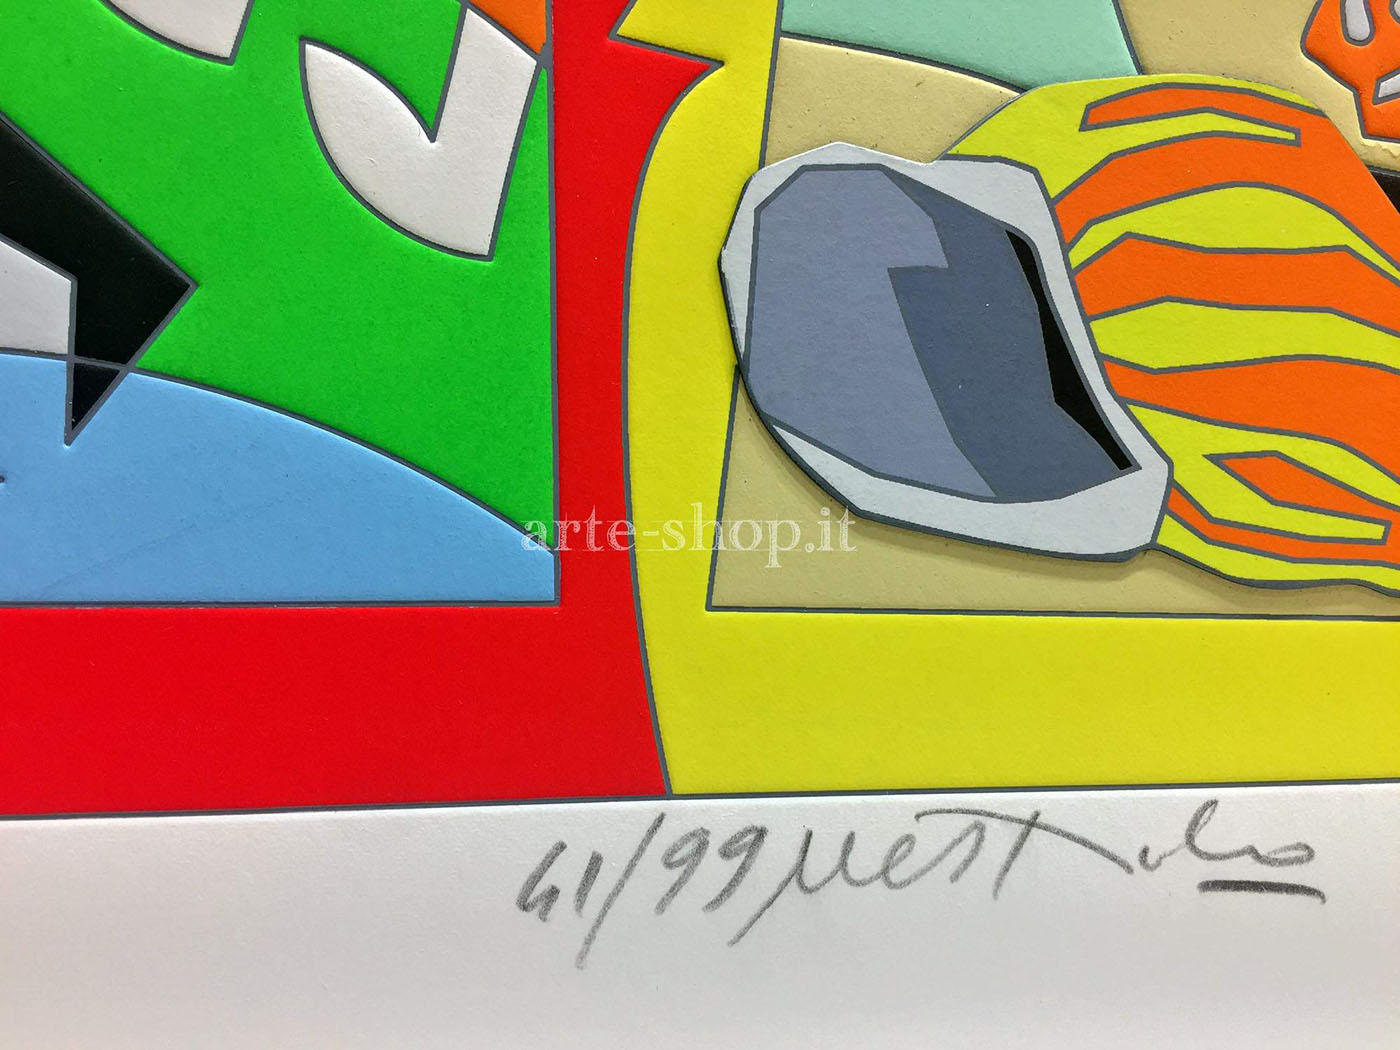 arte pentagono shop dettaglio numero 218